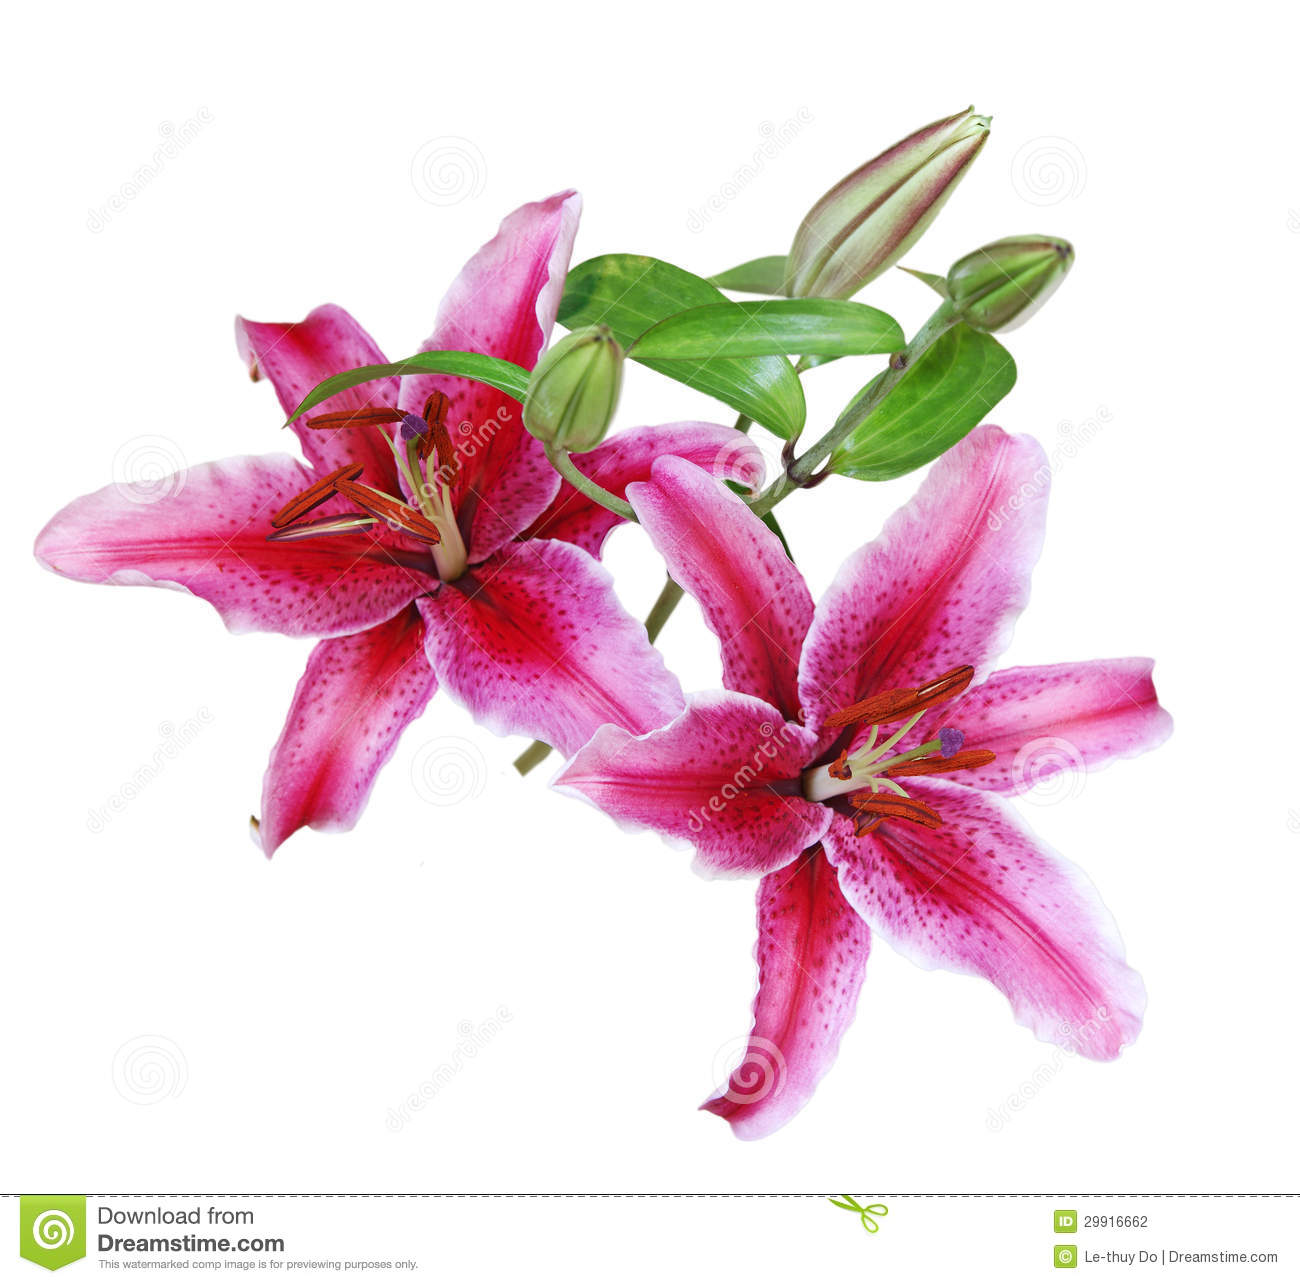 Lilies clipart.